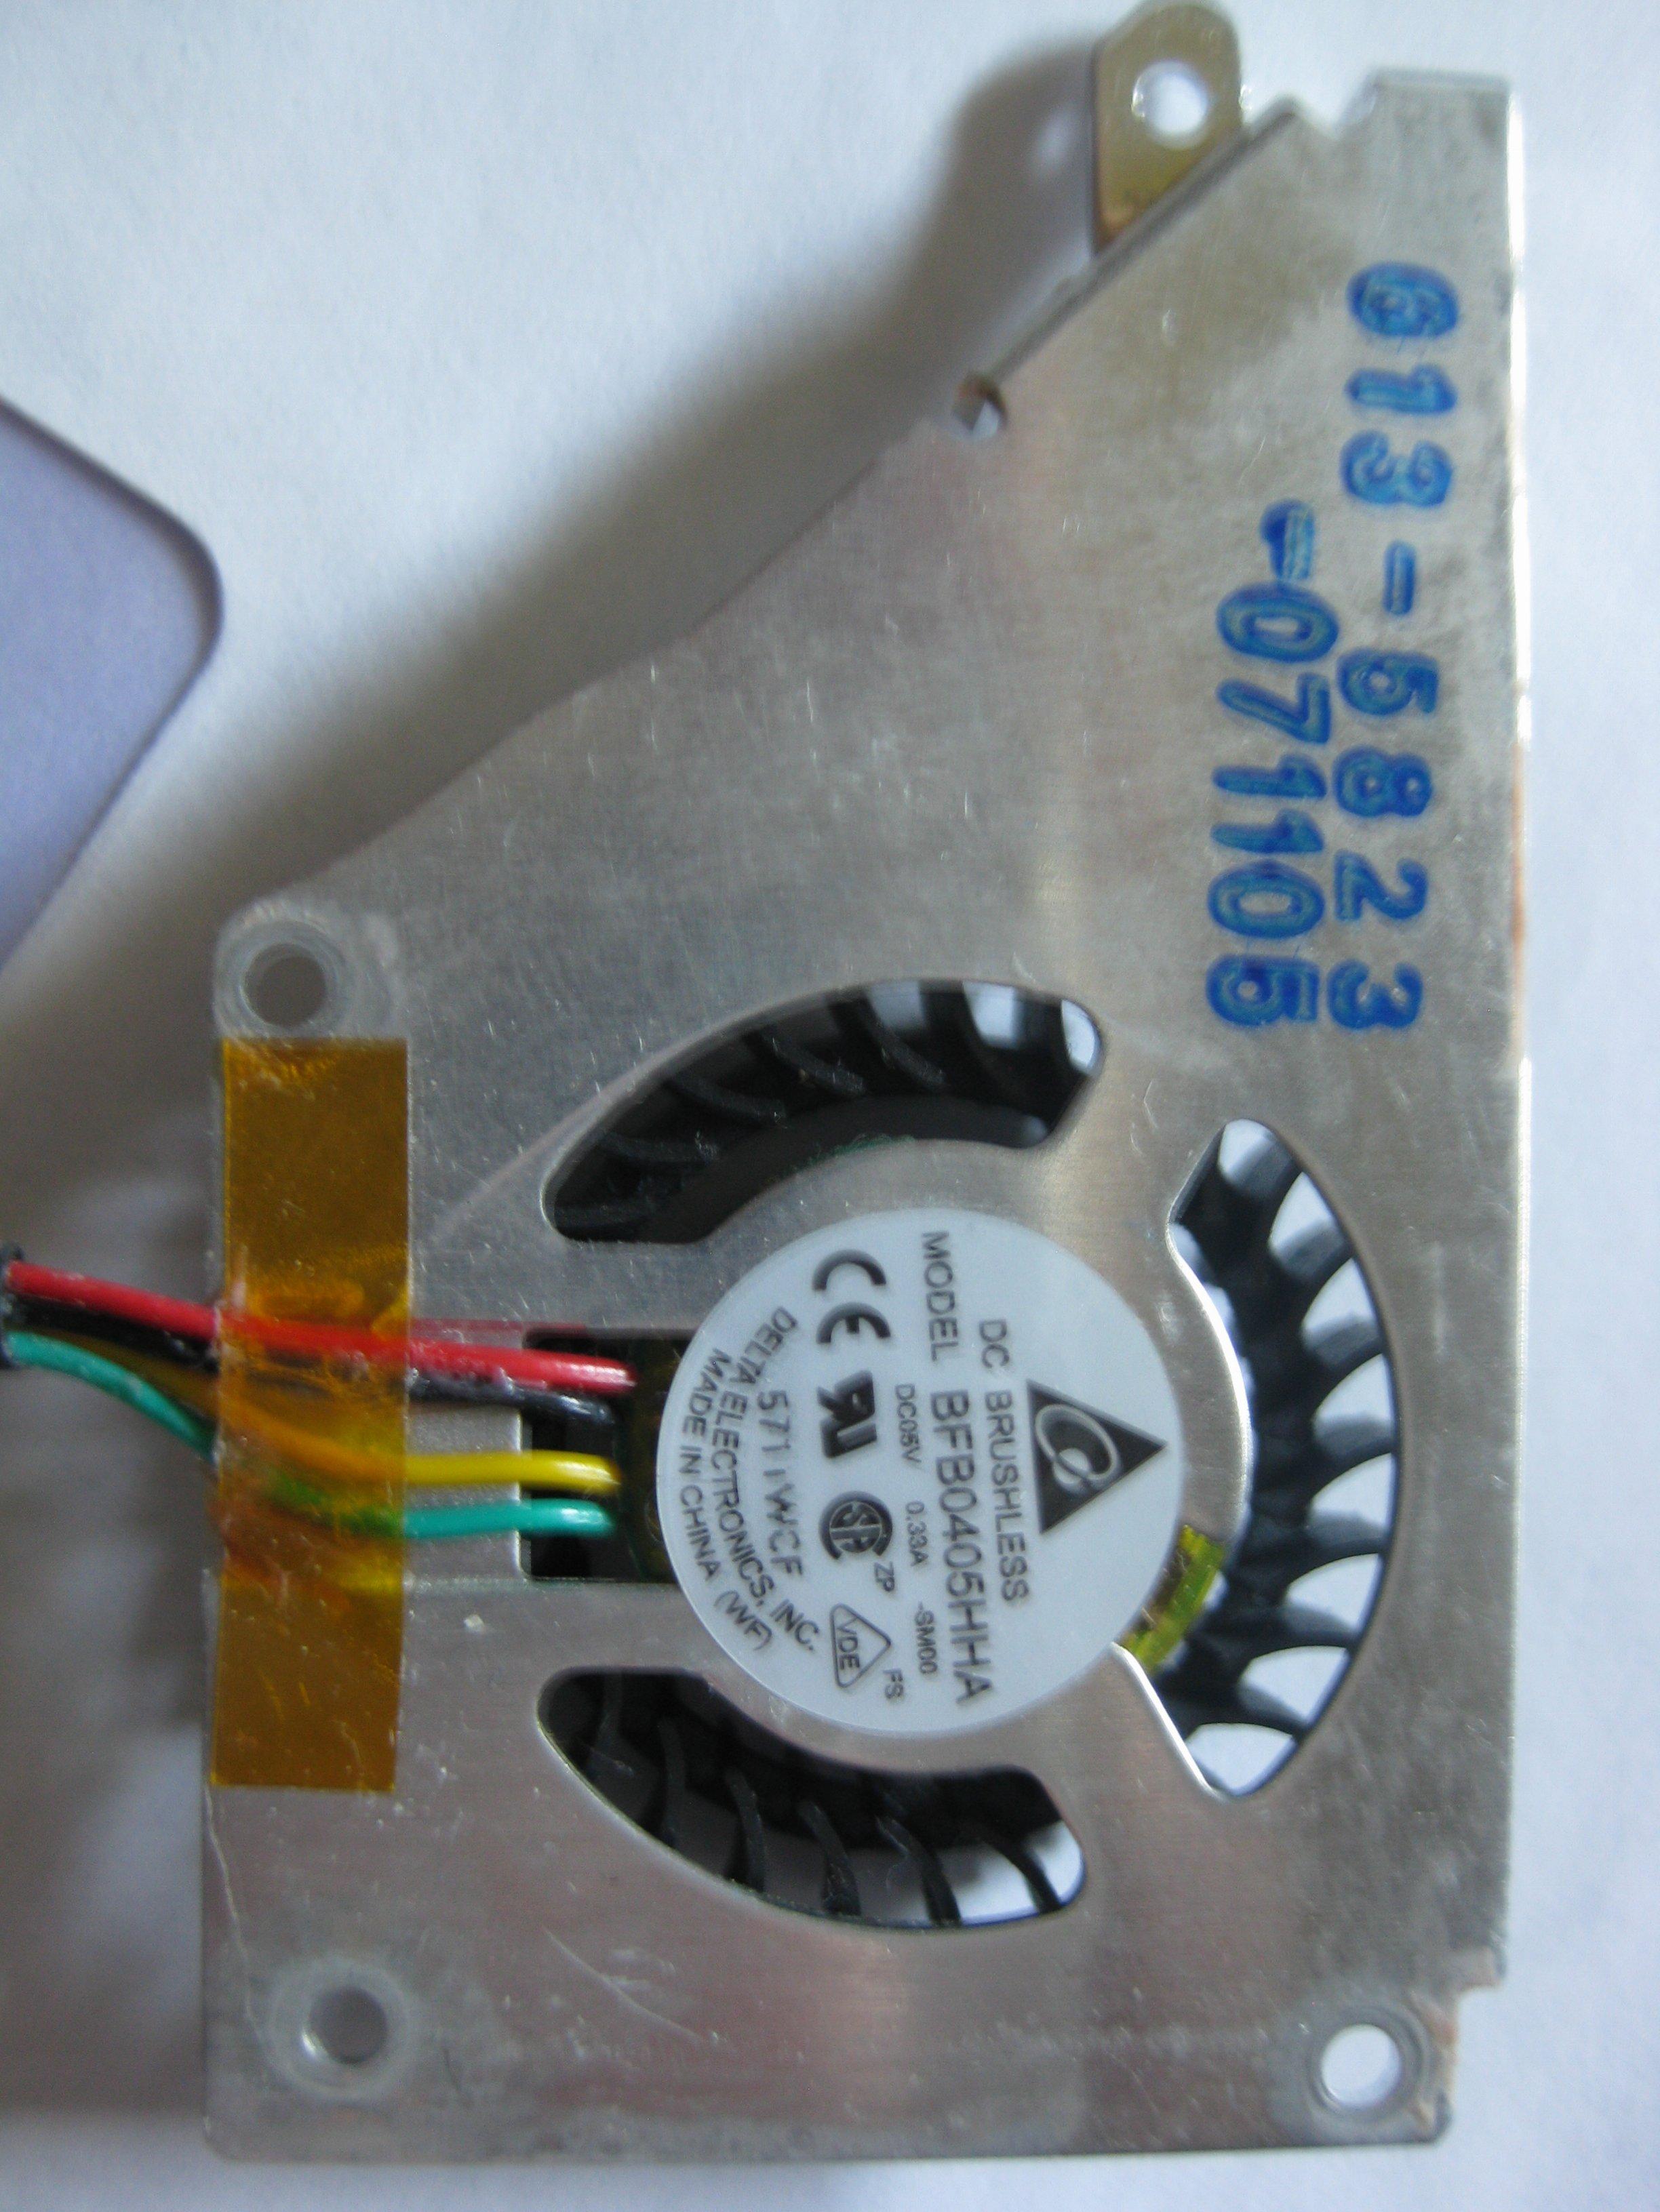 G4 Fan Control 0 5 G4fancontrol 0 6 1 Purchase For Mac